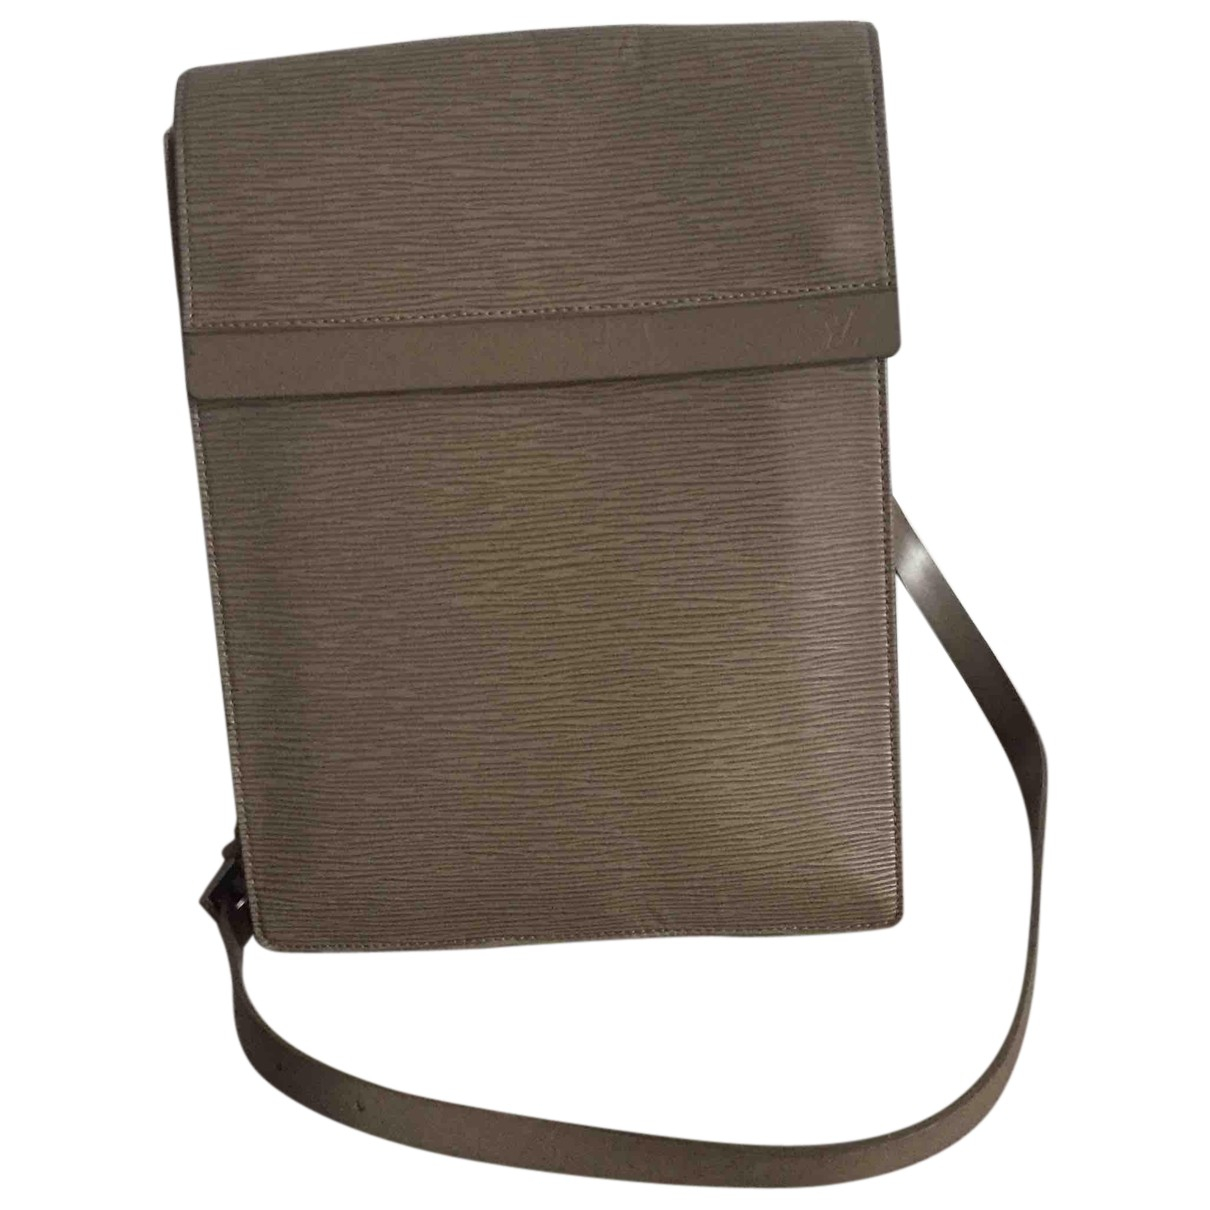 Louis Vuitton \N Handtasche in  Grau Leder